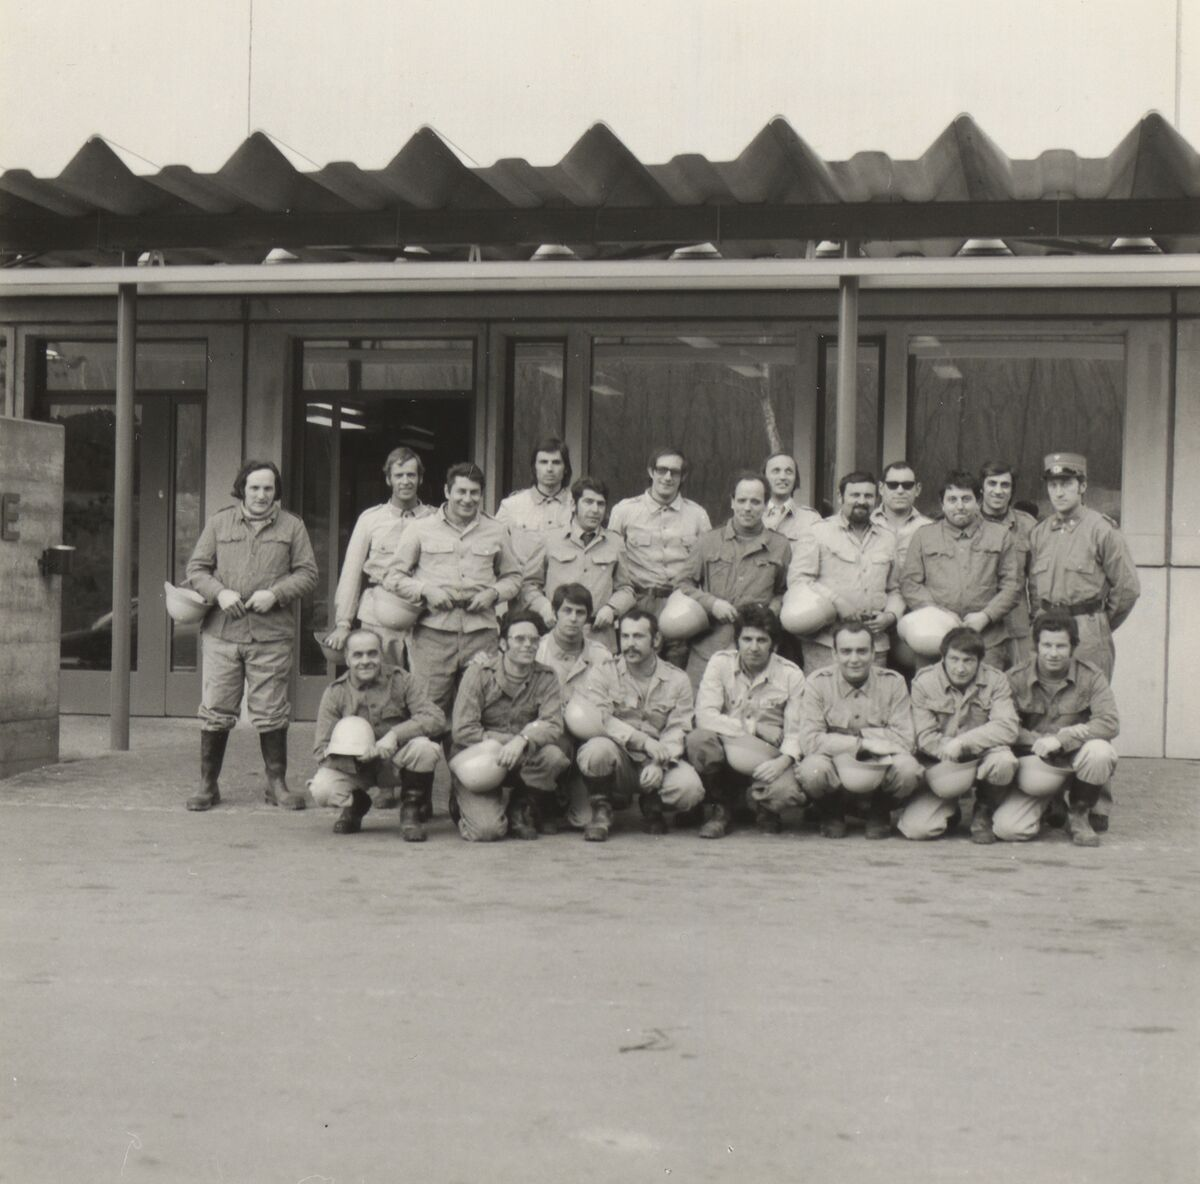 GFA 42/62140: Photo report of the plant fire brigade